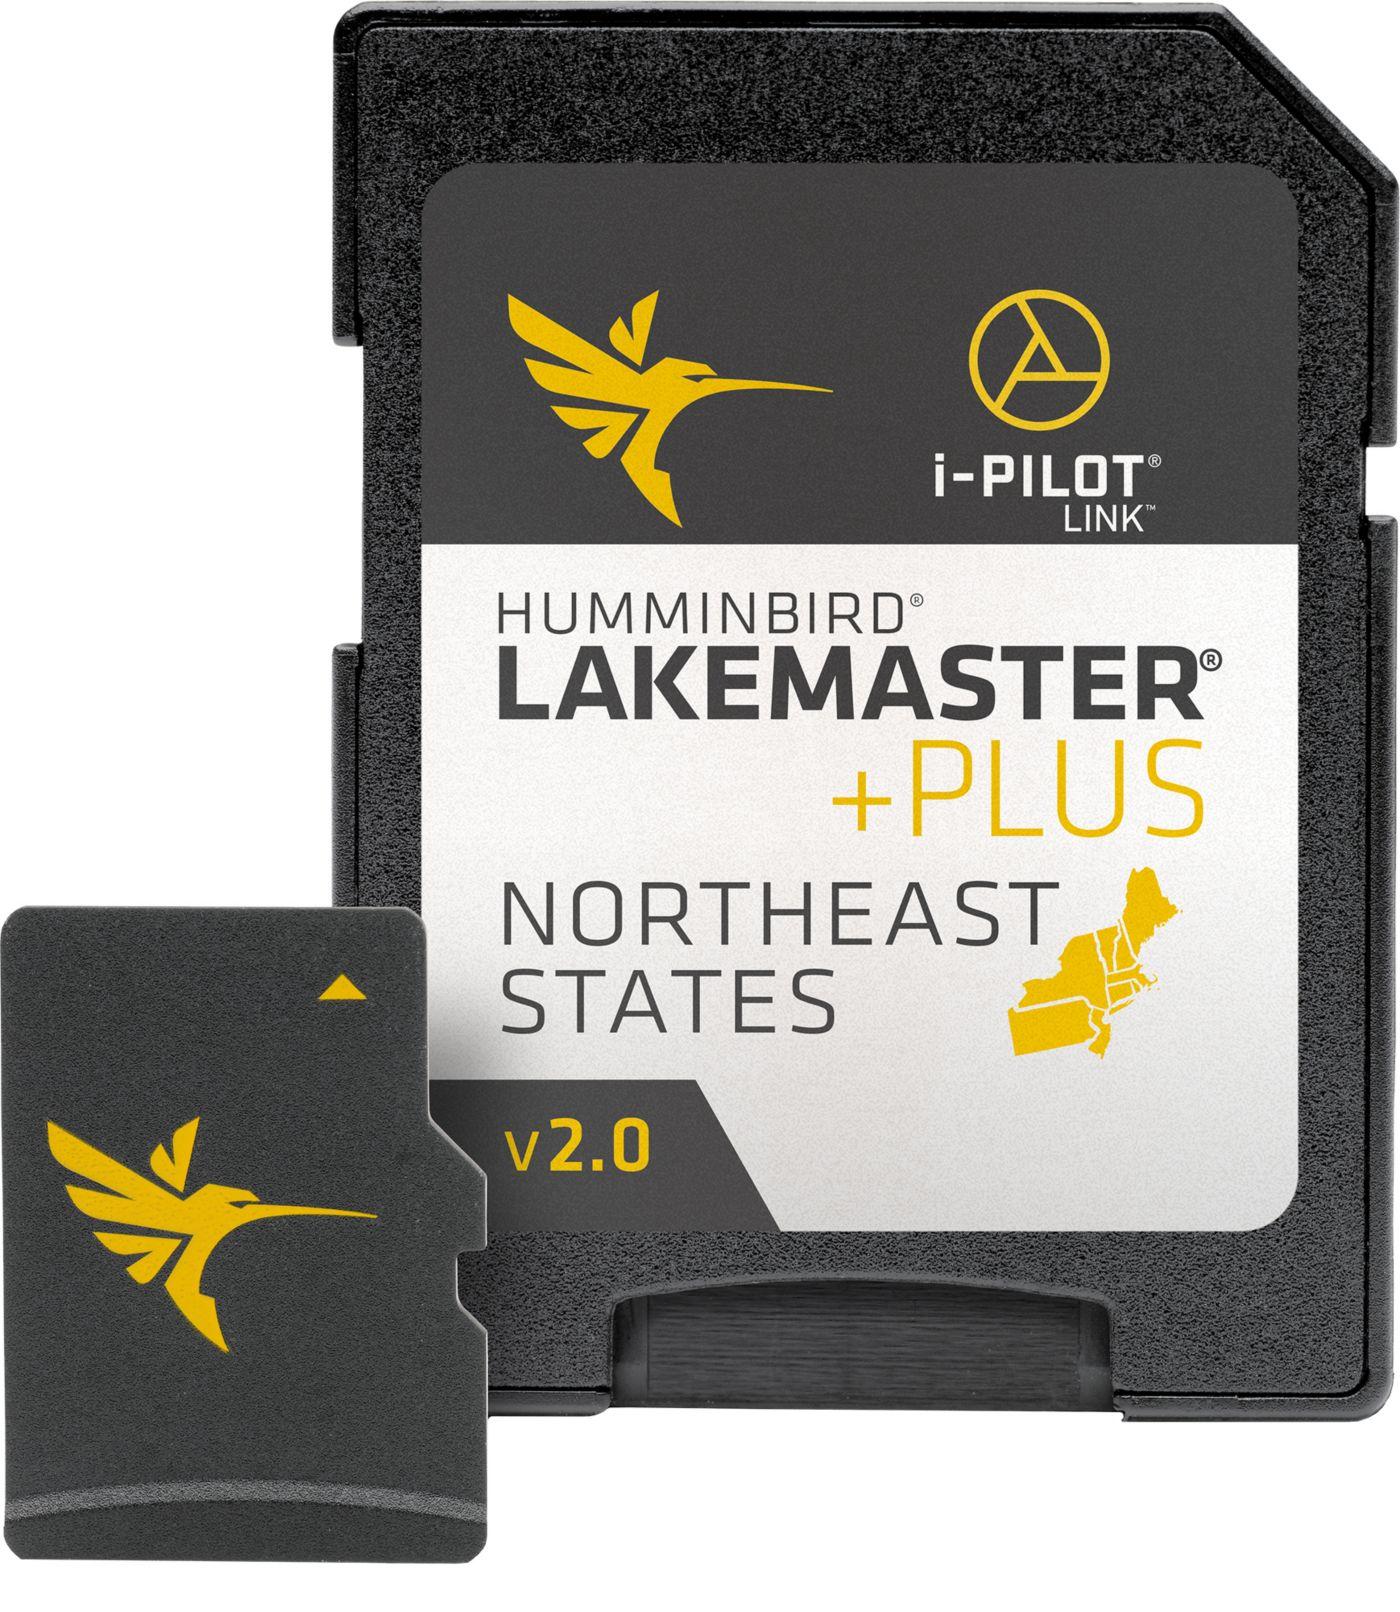 Humminbird LakeMaster Northeast States V2 Map Card